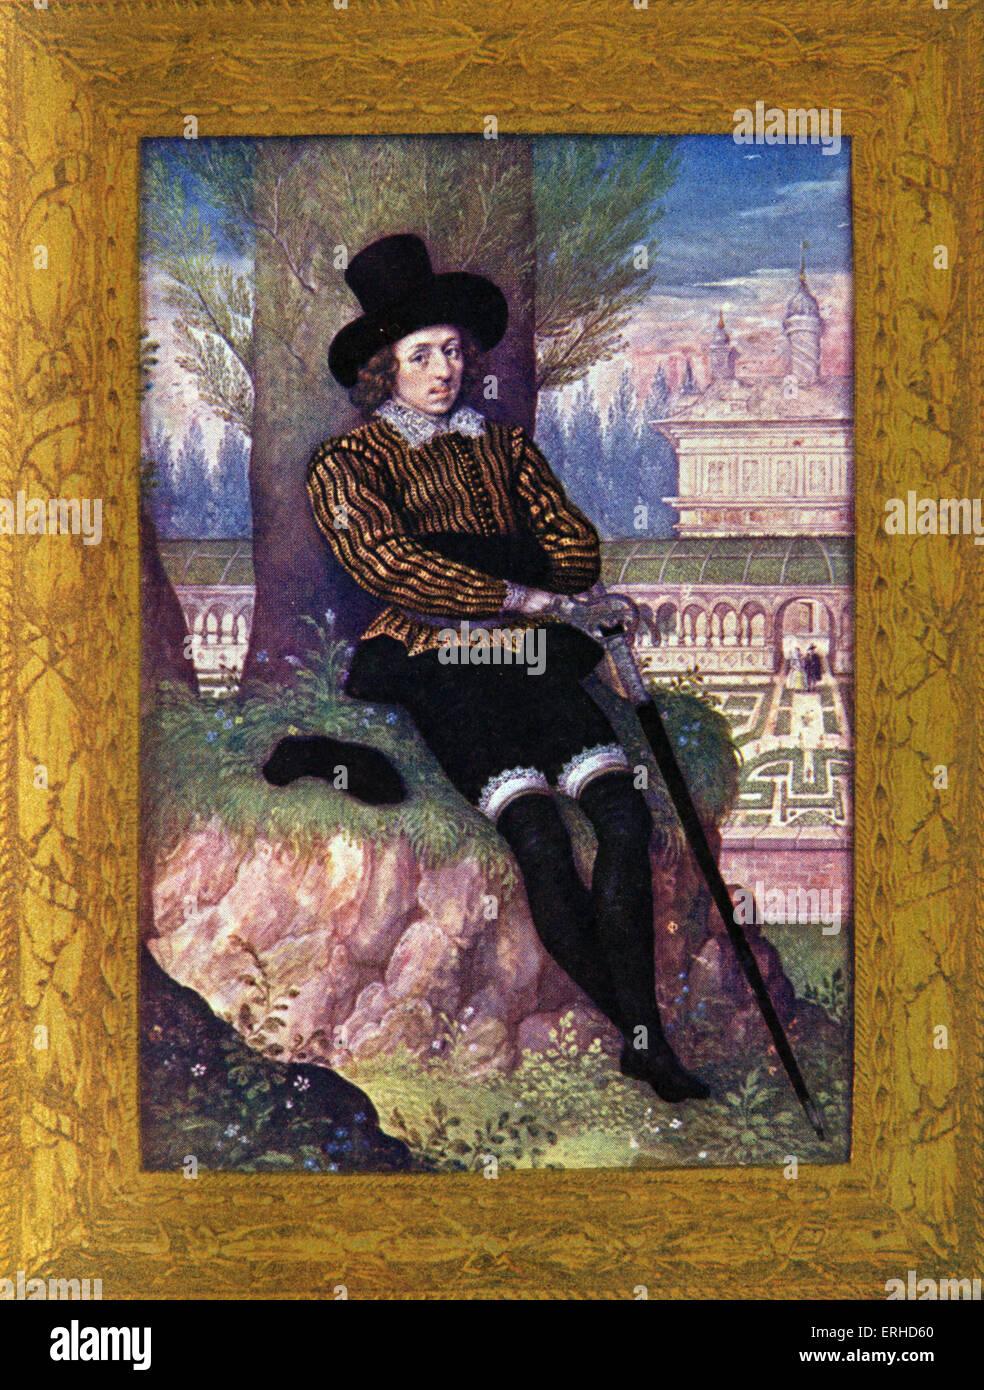 Sir Philip SIDNEY  - miniature portrait by Oliver.  Elizabethan Poet & Courtier. Wrote Arcadia. Elizabethan/Jacobean - Stock Image